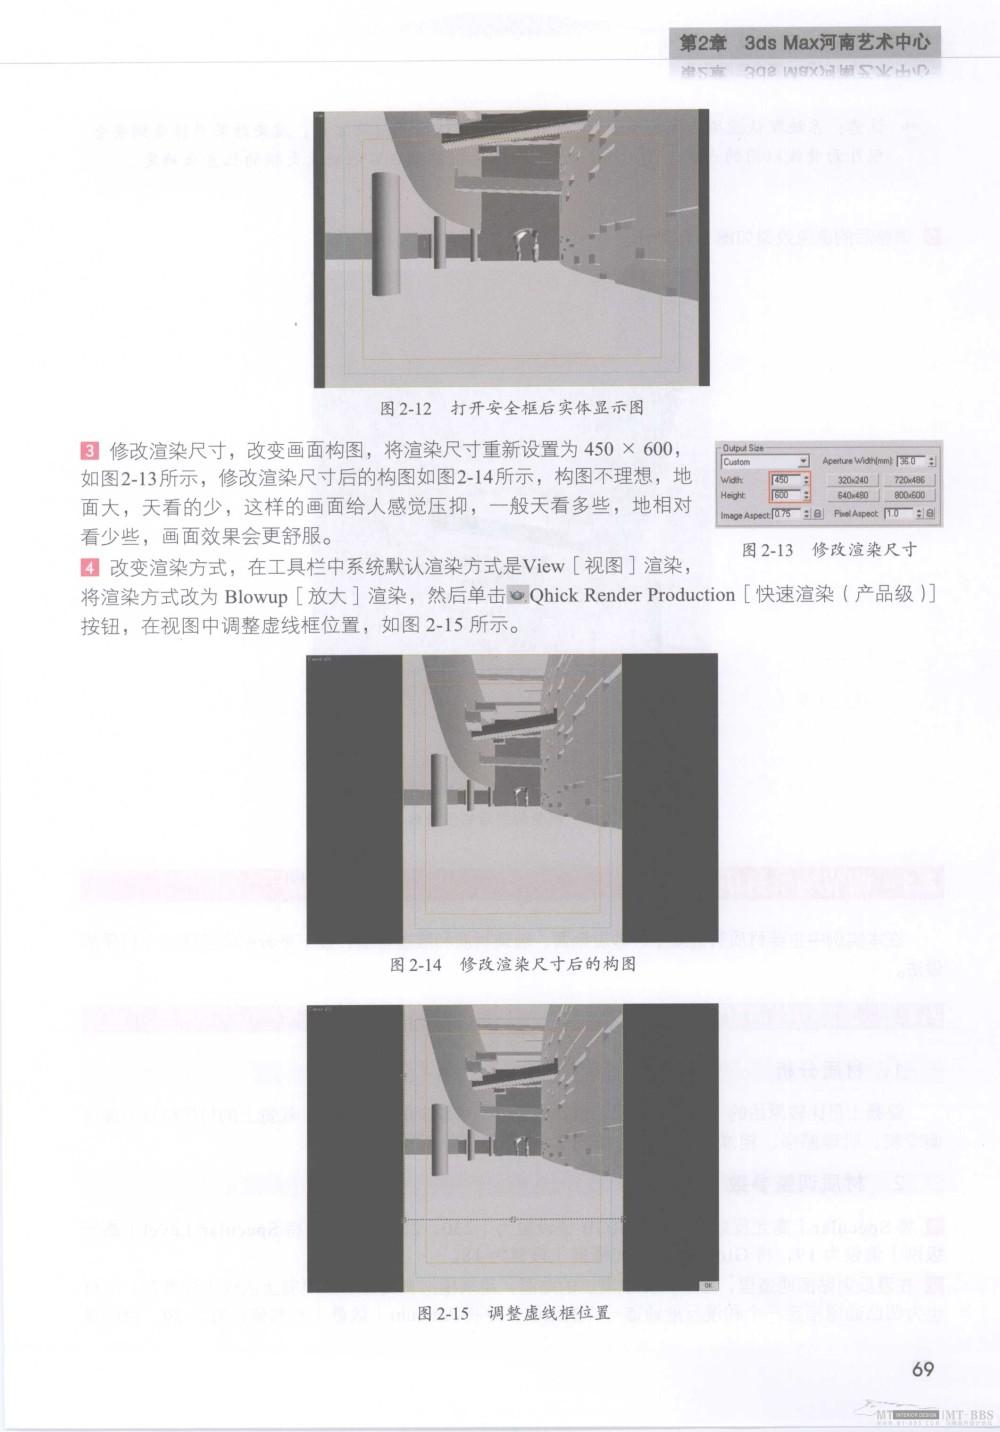 水晶石技法-3ds_Max&VRay室内空间表现_水晶石技法-3ds_Max&VRay室内空间表现_页面_075.jpg